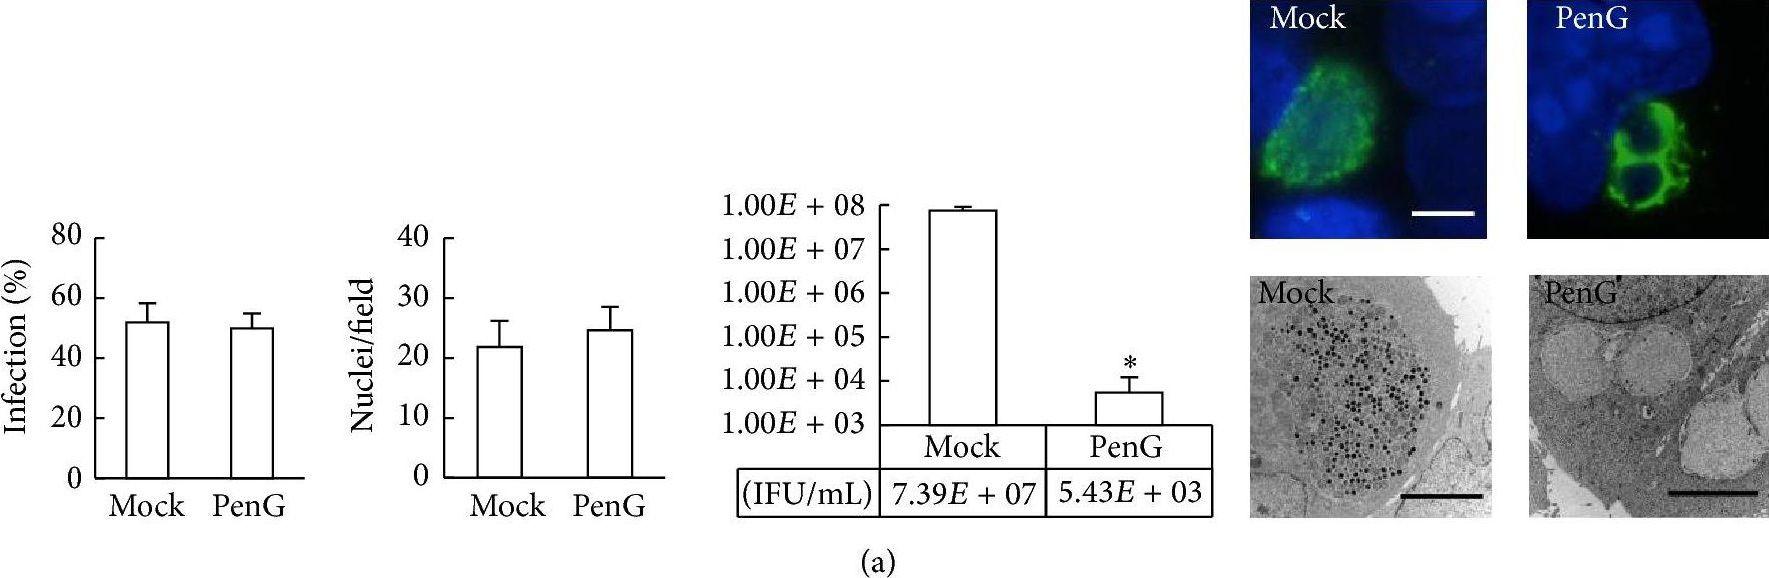 Penicillin G-Induced Chlamydial Stress Response in a Porcine Strain of Chlamydia pecorum.